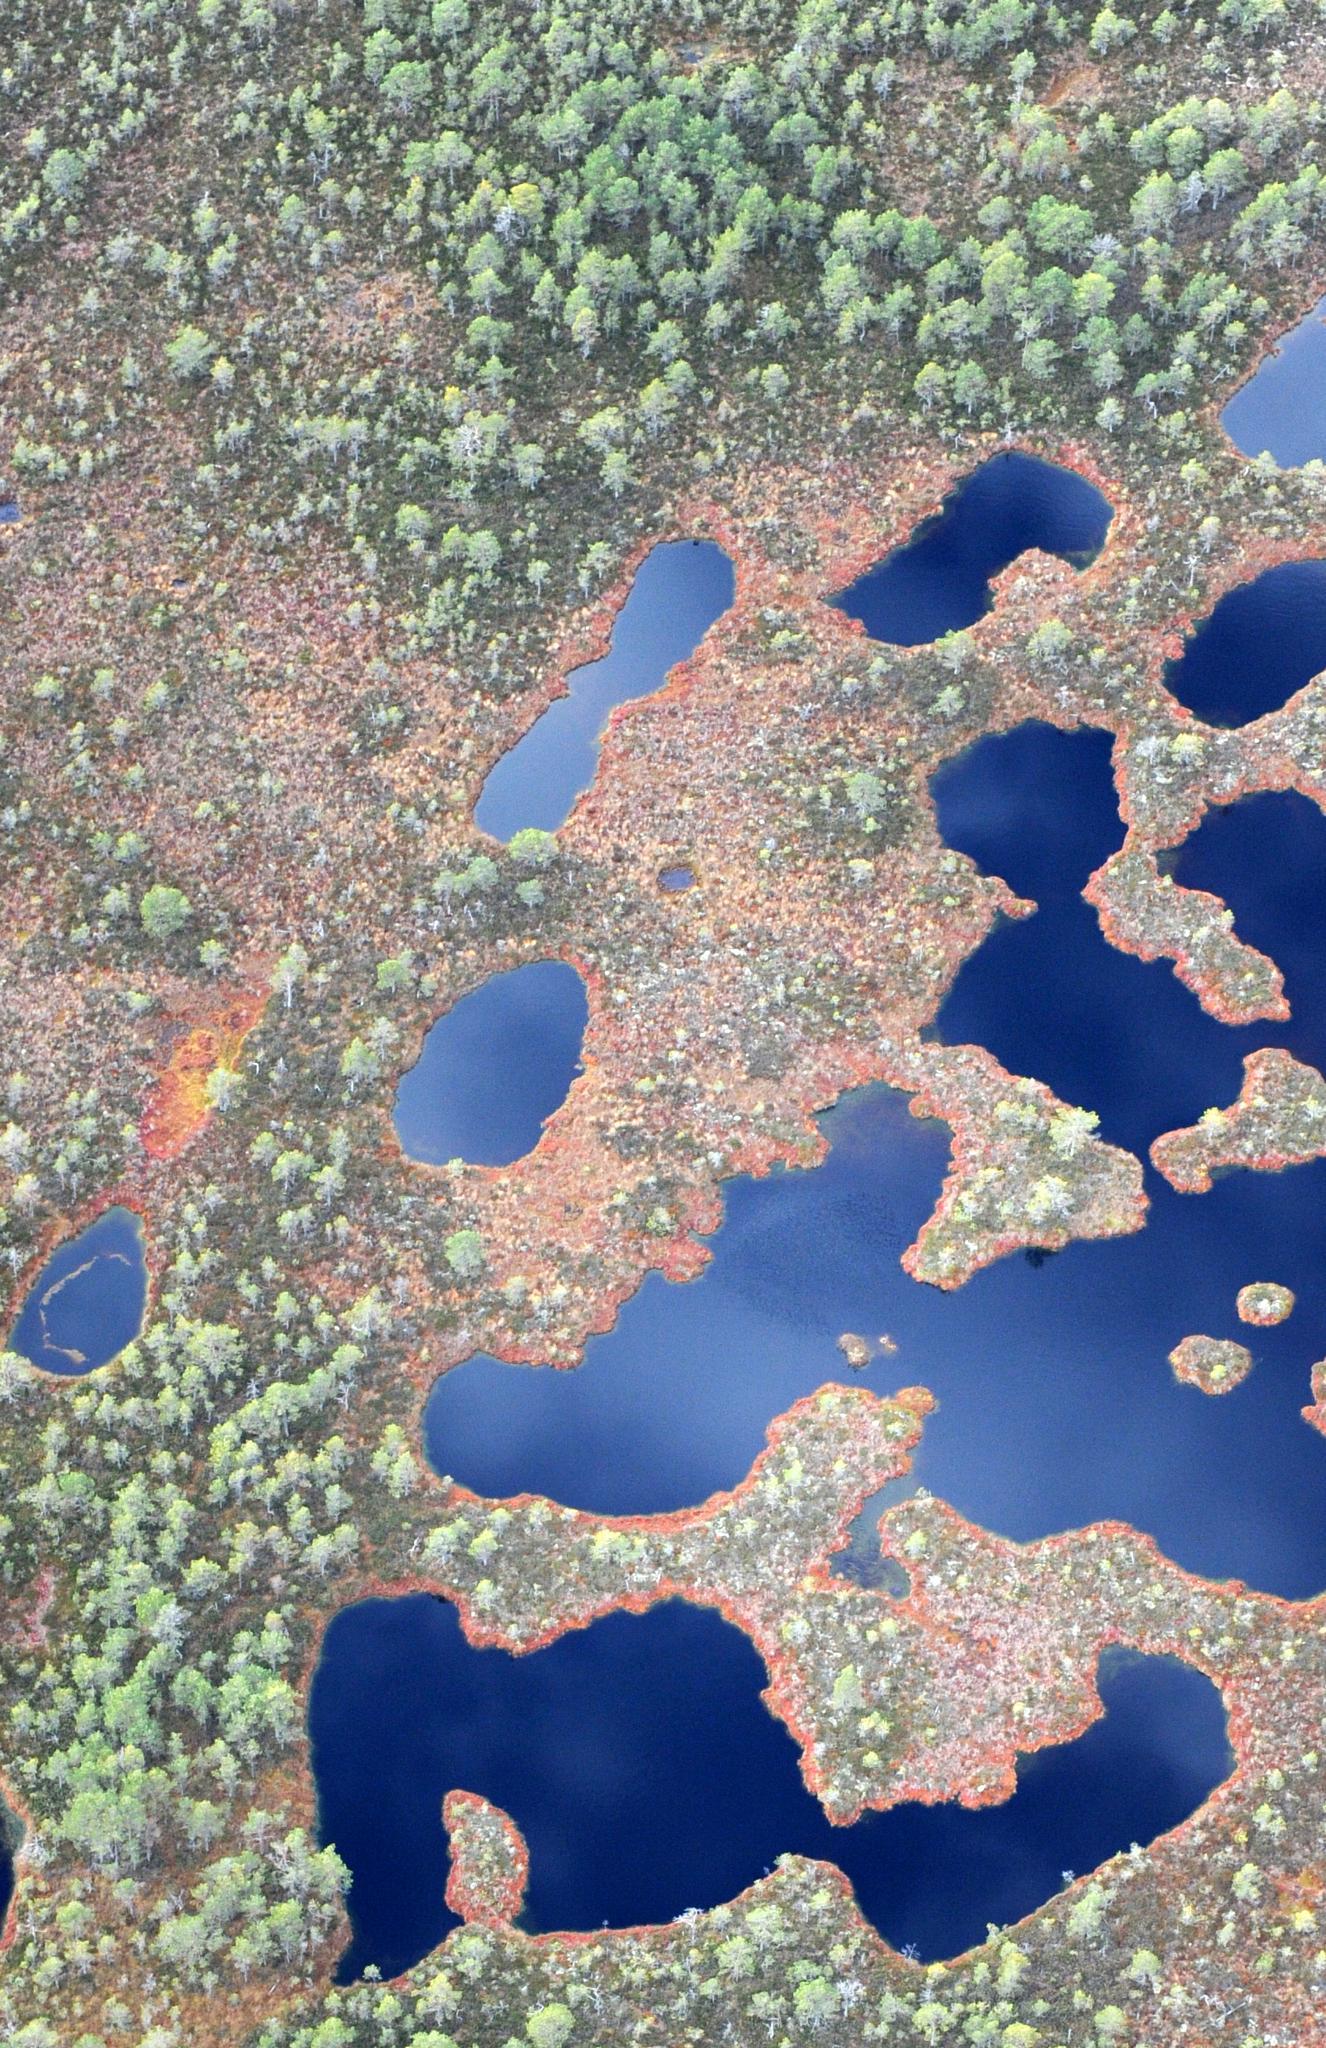 Estonian nature 17.10.2014 by lasse.tur